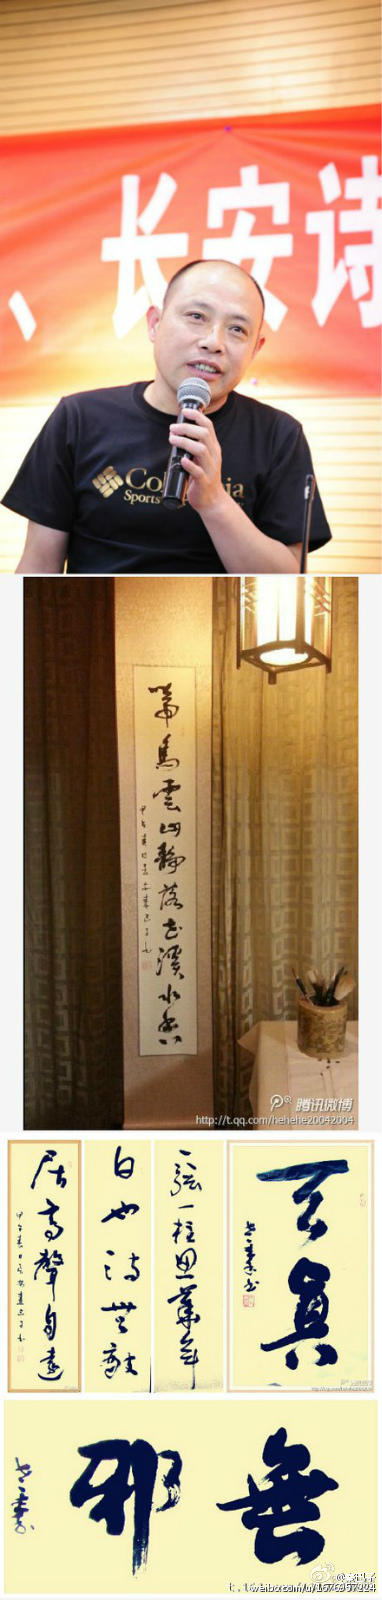 Qin Bazi Kalligraphie 1